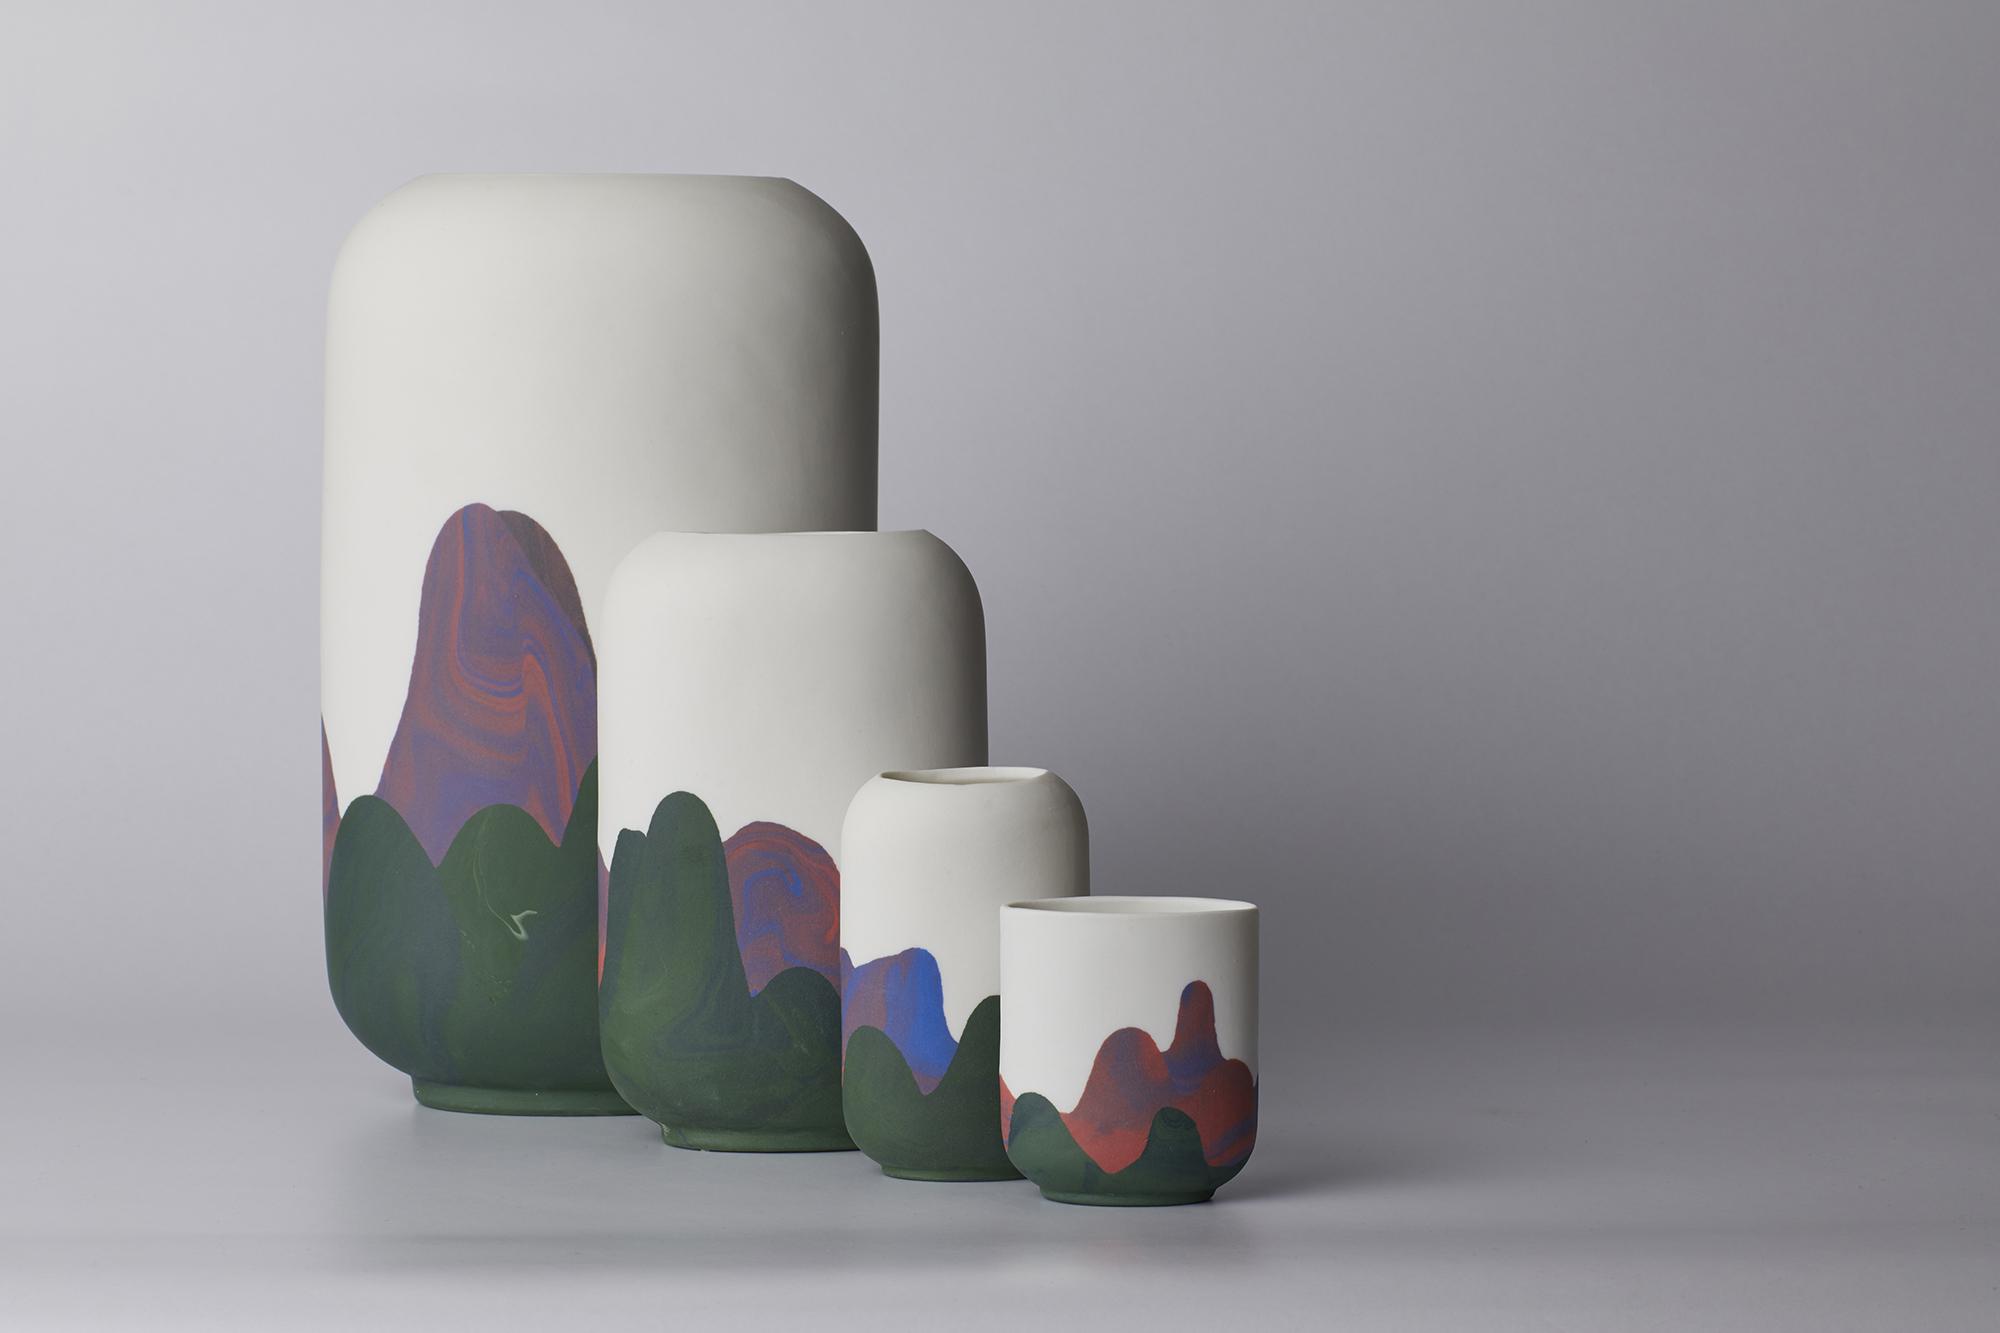 Sham Shui Po Range:  green, red, blue tones; Large vase to cup